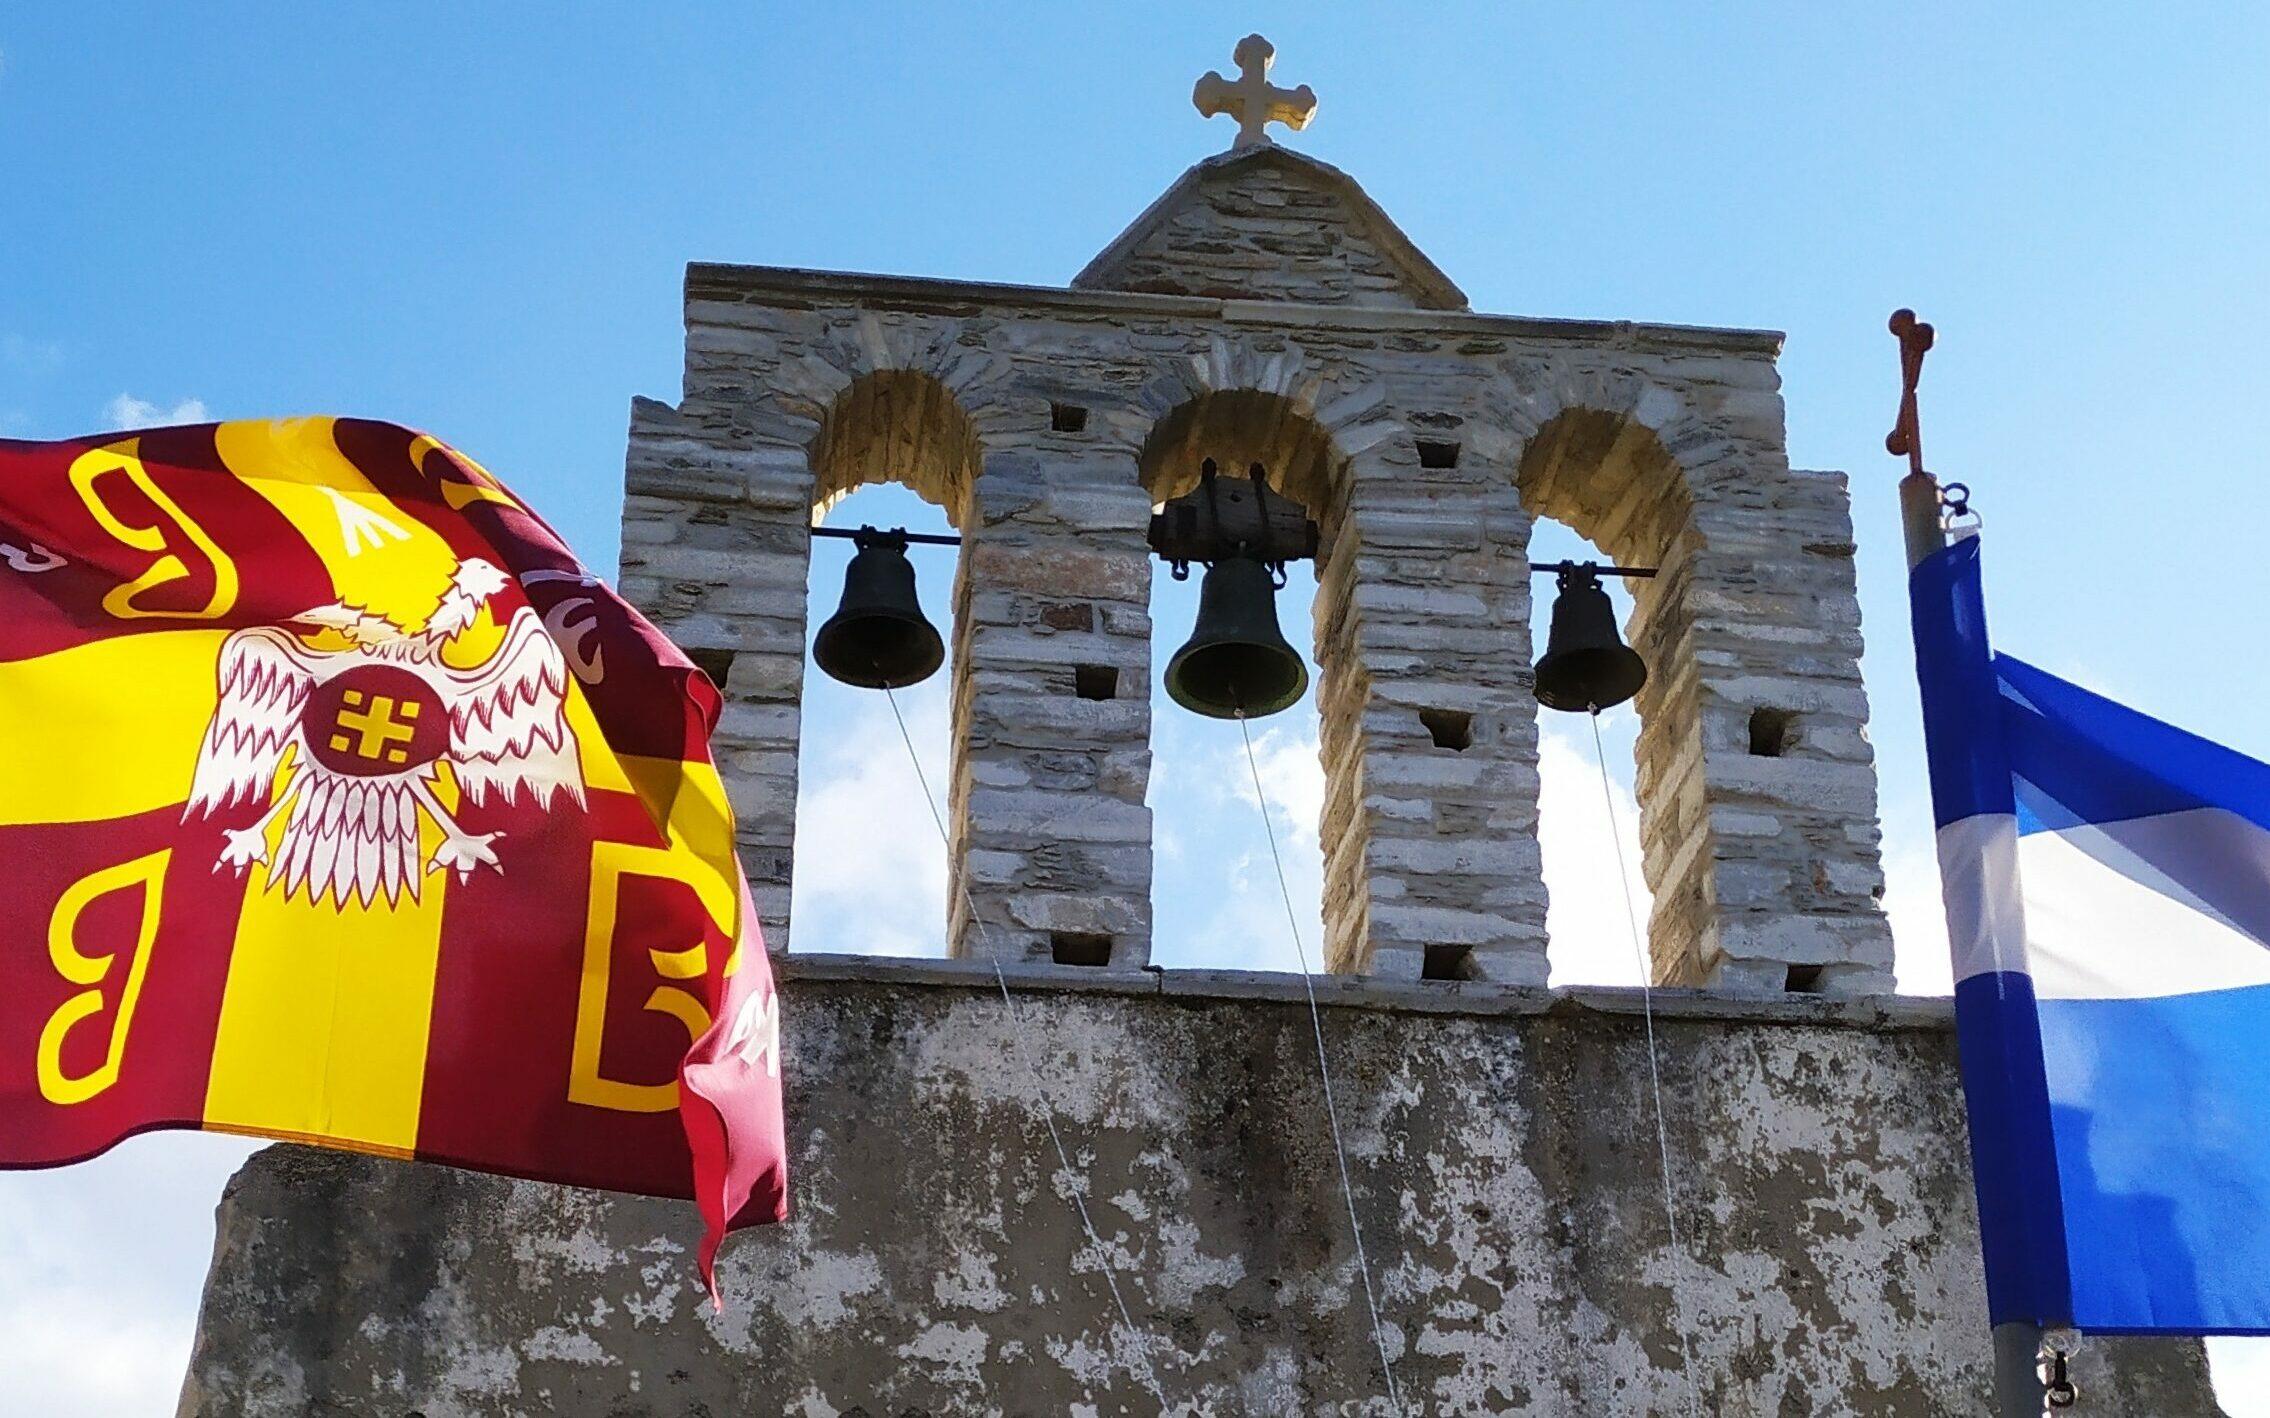 Panagia Drosiani: The most historic church of Naxos